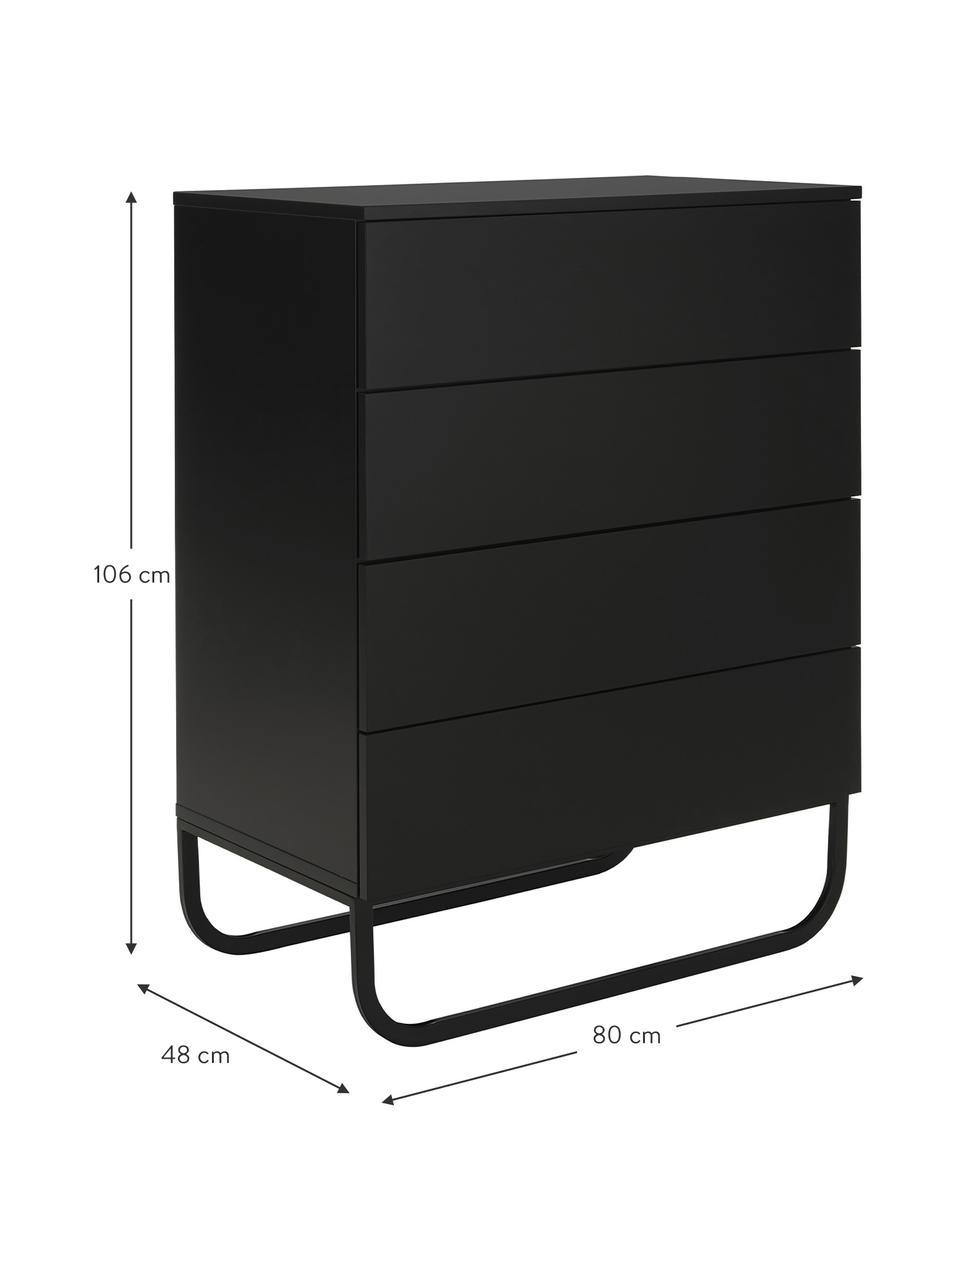 Cassettiera nera Sanford, Nero, Larg. 80 x Alt. 106 cm